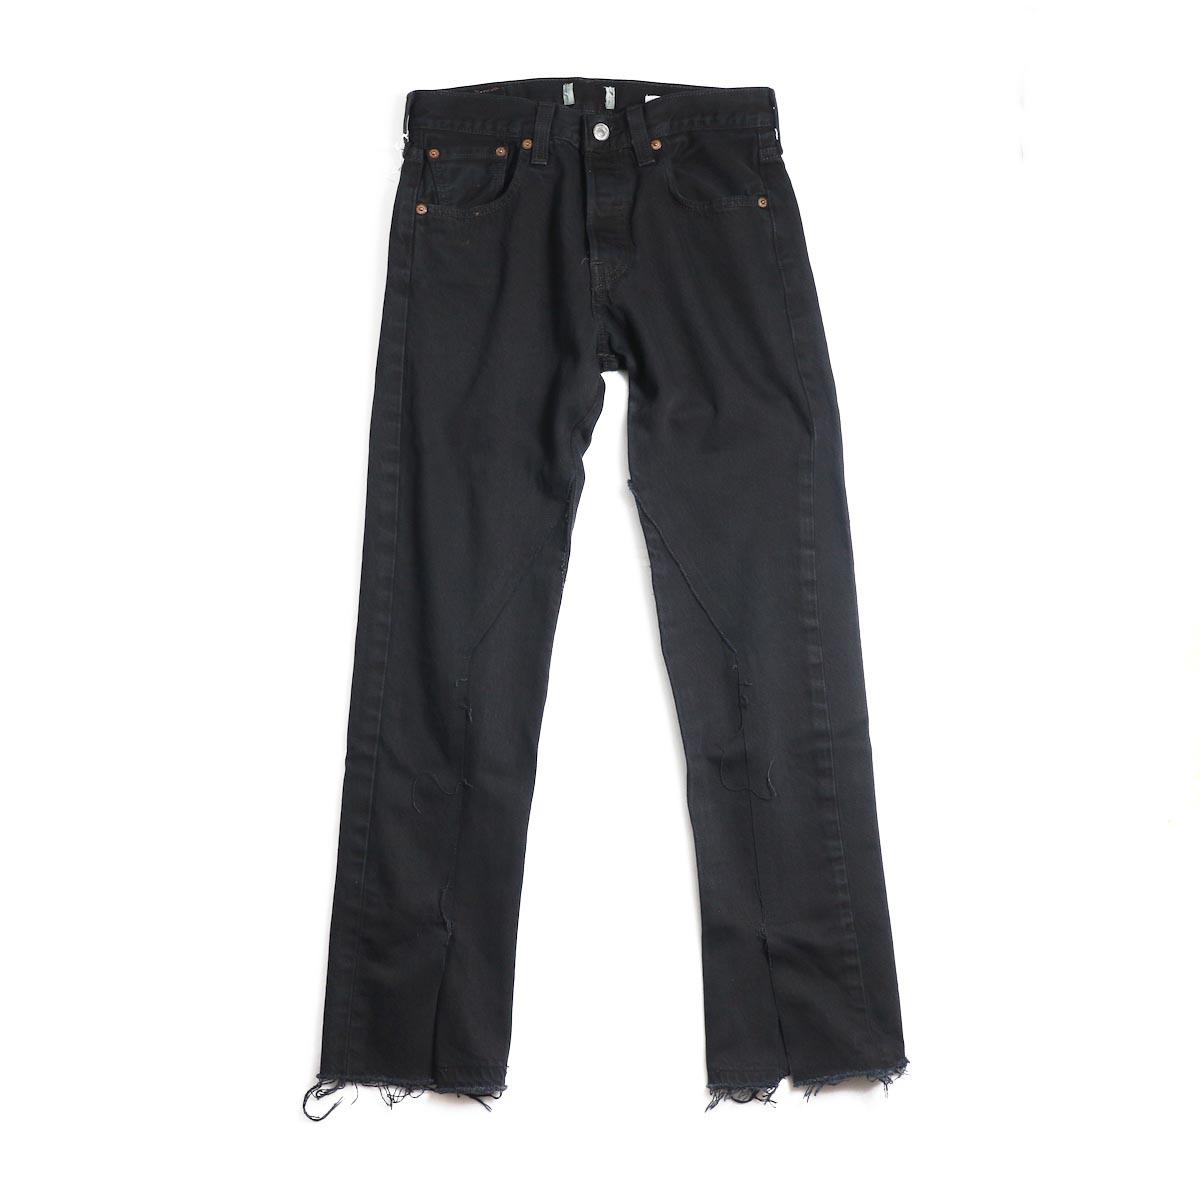 OLD PARK / Slit Jeans -Black Ssize(E)